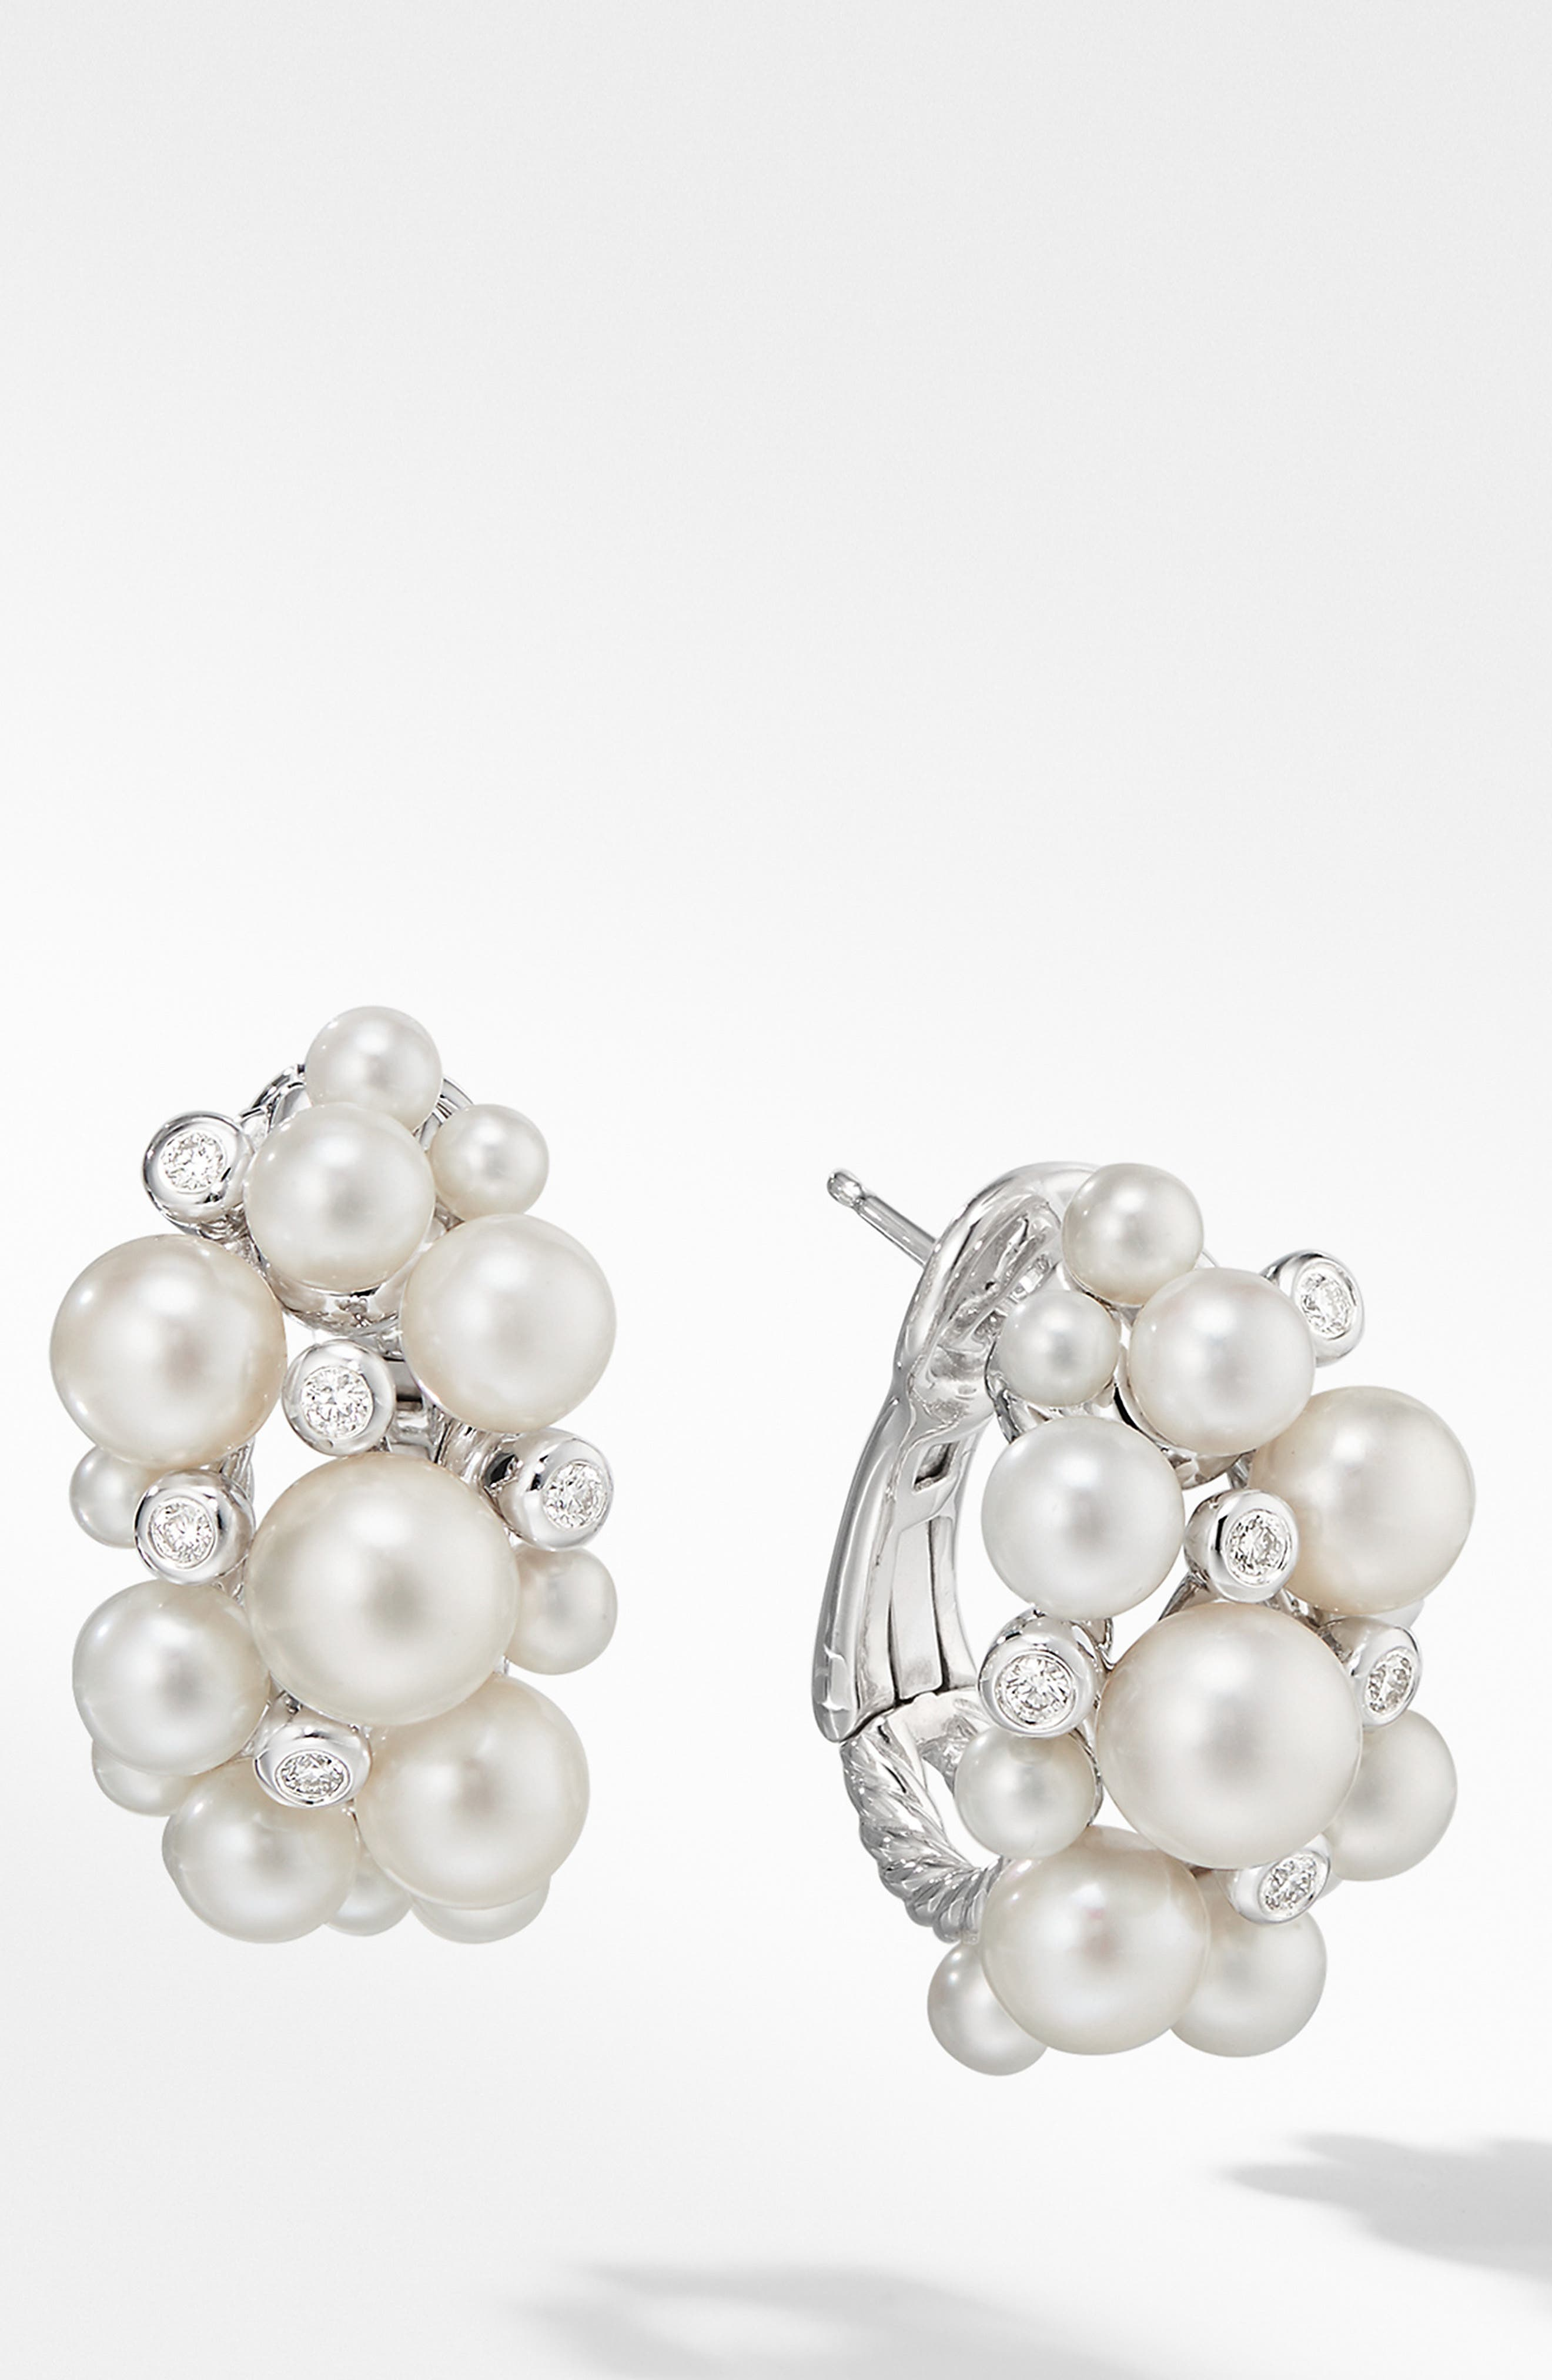 DAVID YURMAN, Large Pearl Cluster Hoop Earrings with Diamonds, Main thumbnail 1, color, PEARL